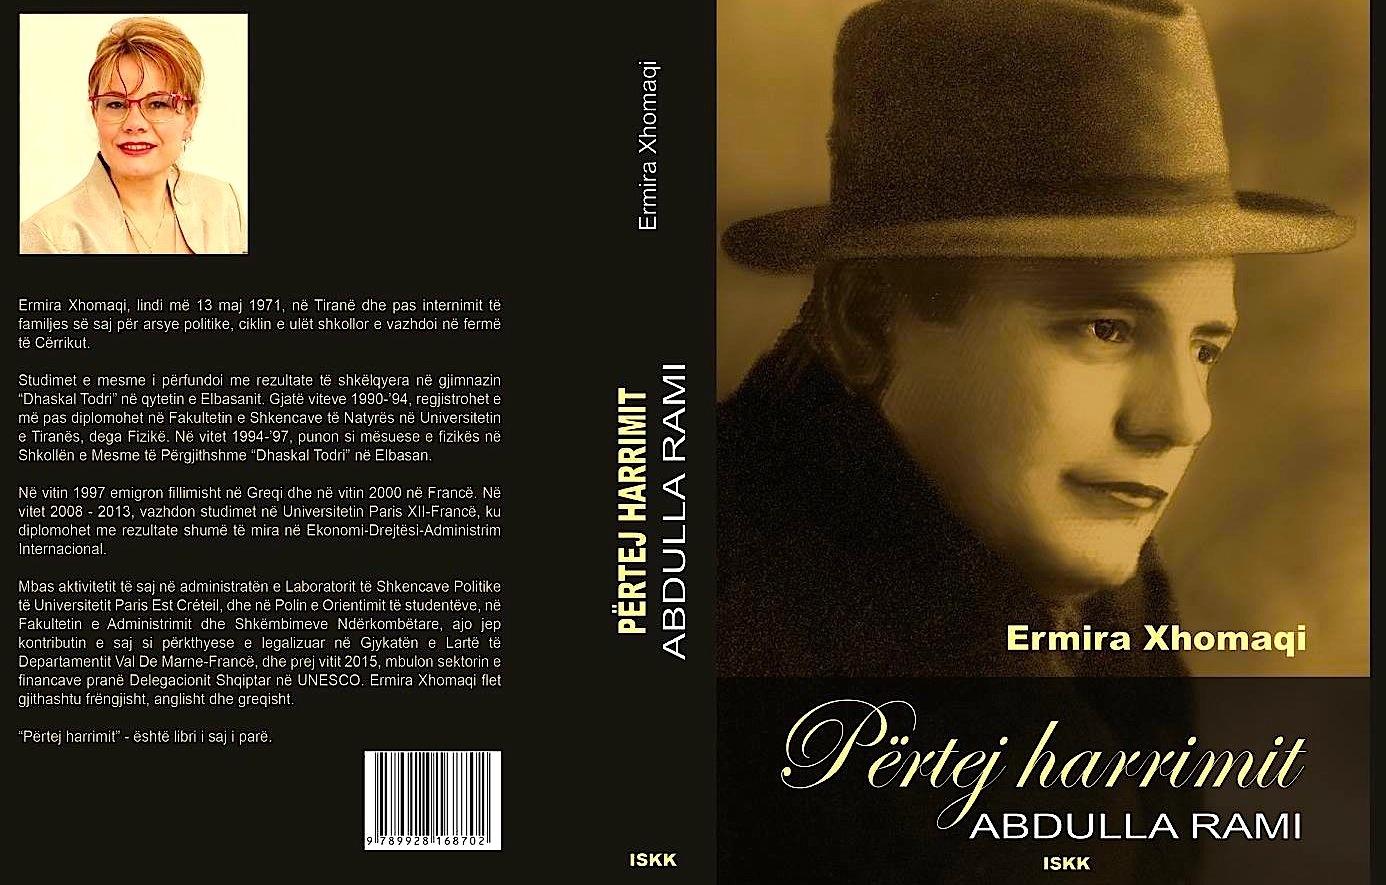 Ermira Xhomaqi - Përtej Harrimit - Abdulla Rami